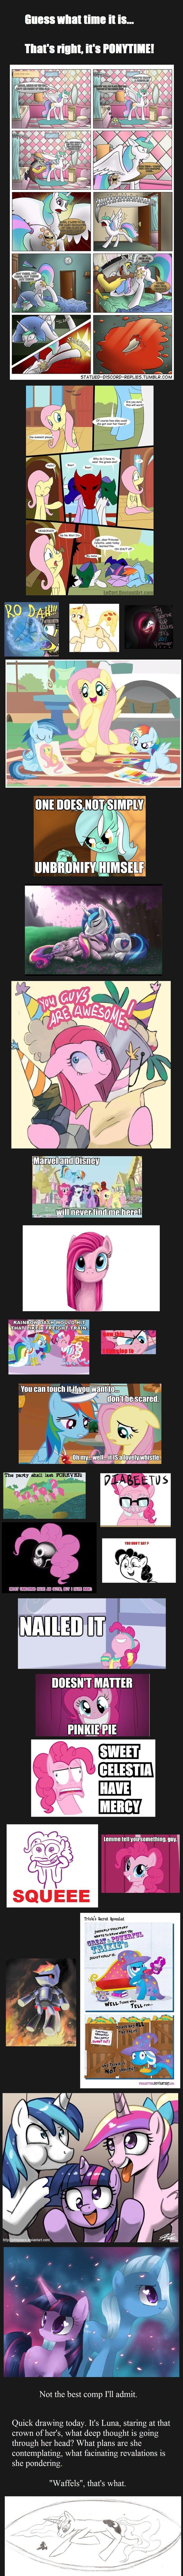 Ponycomp 141. Ponycomp 140: funnyjunk.com/channel/ponytime/Ponycomp+140/keoaGxr/ DOWNLOAD LINK www.mediafire.com/?eeoxr0quxvkz0 My DeviantART: .. That's a lot of Pinkie Pie posts! My Little Pony ponies ponytime